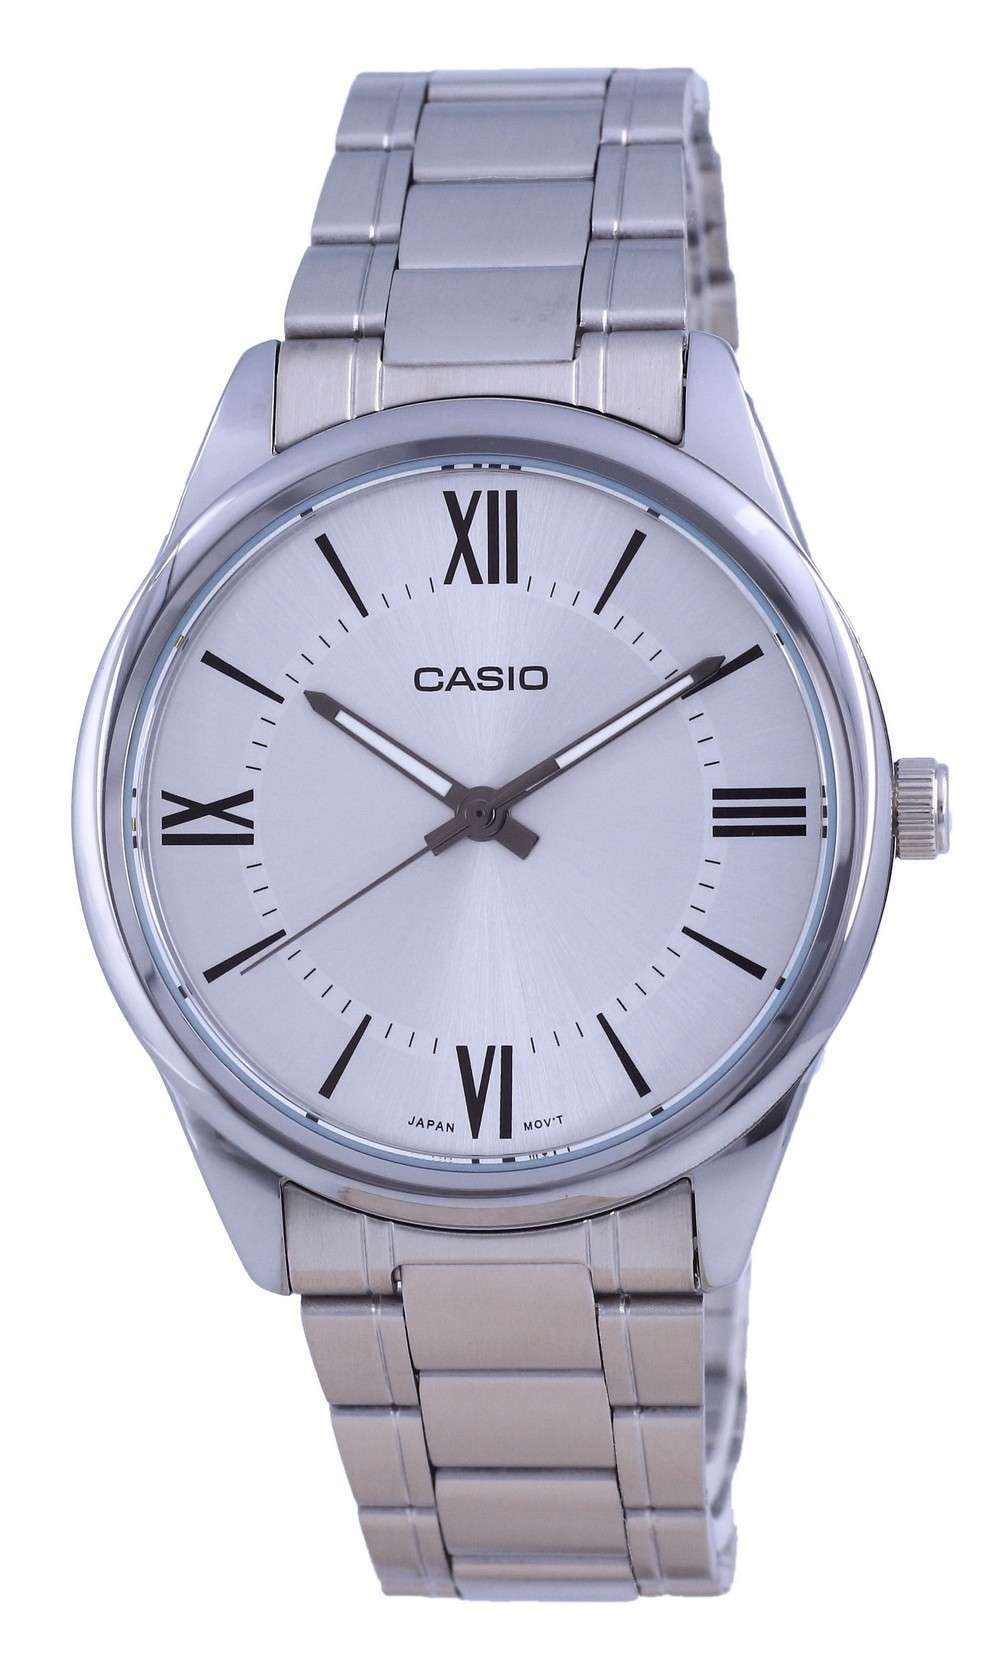 Reloj Casio de cuarzo analógico de acero inoxidable con esfera plateada MTP-V005D-7B5 MTPV005D-7 para hombre